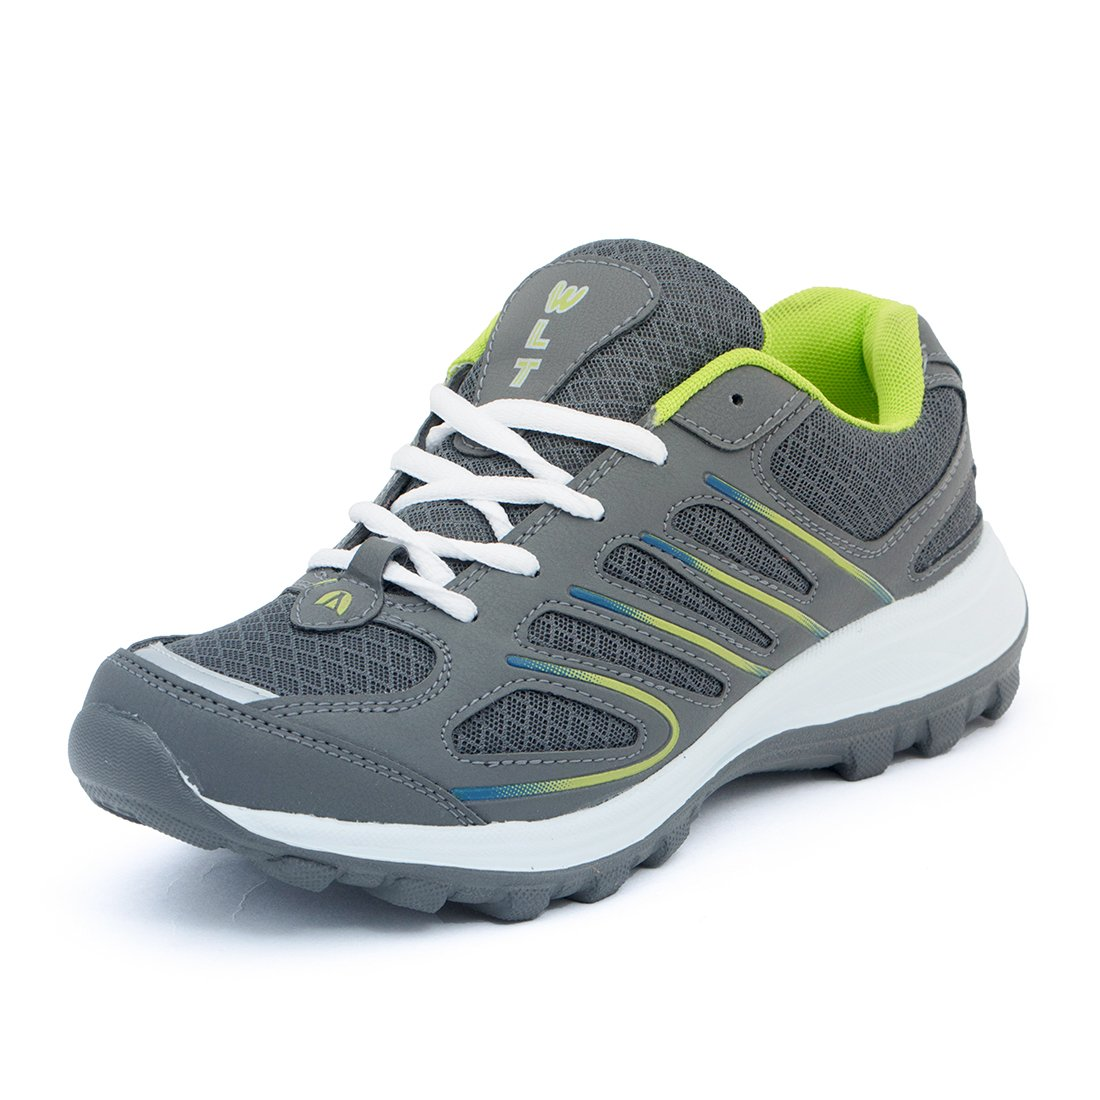 ASIAN Men's Mesh Bullet Range Running Shoes product image